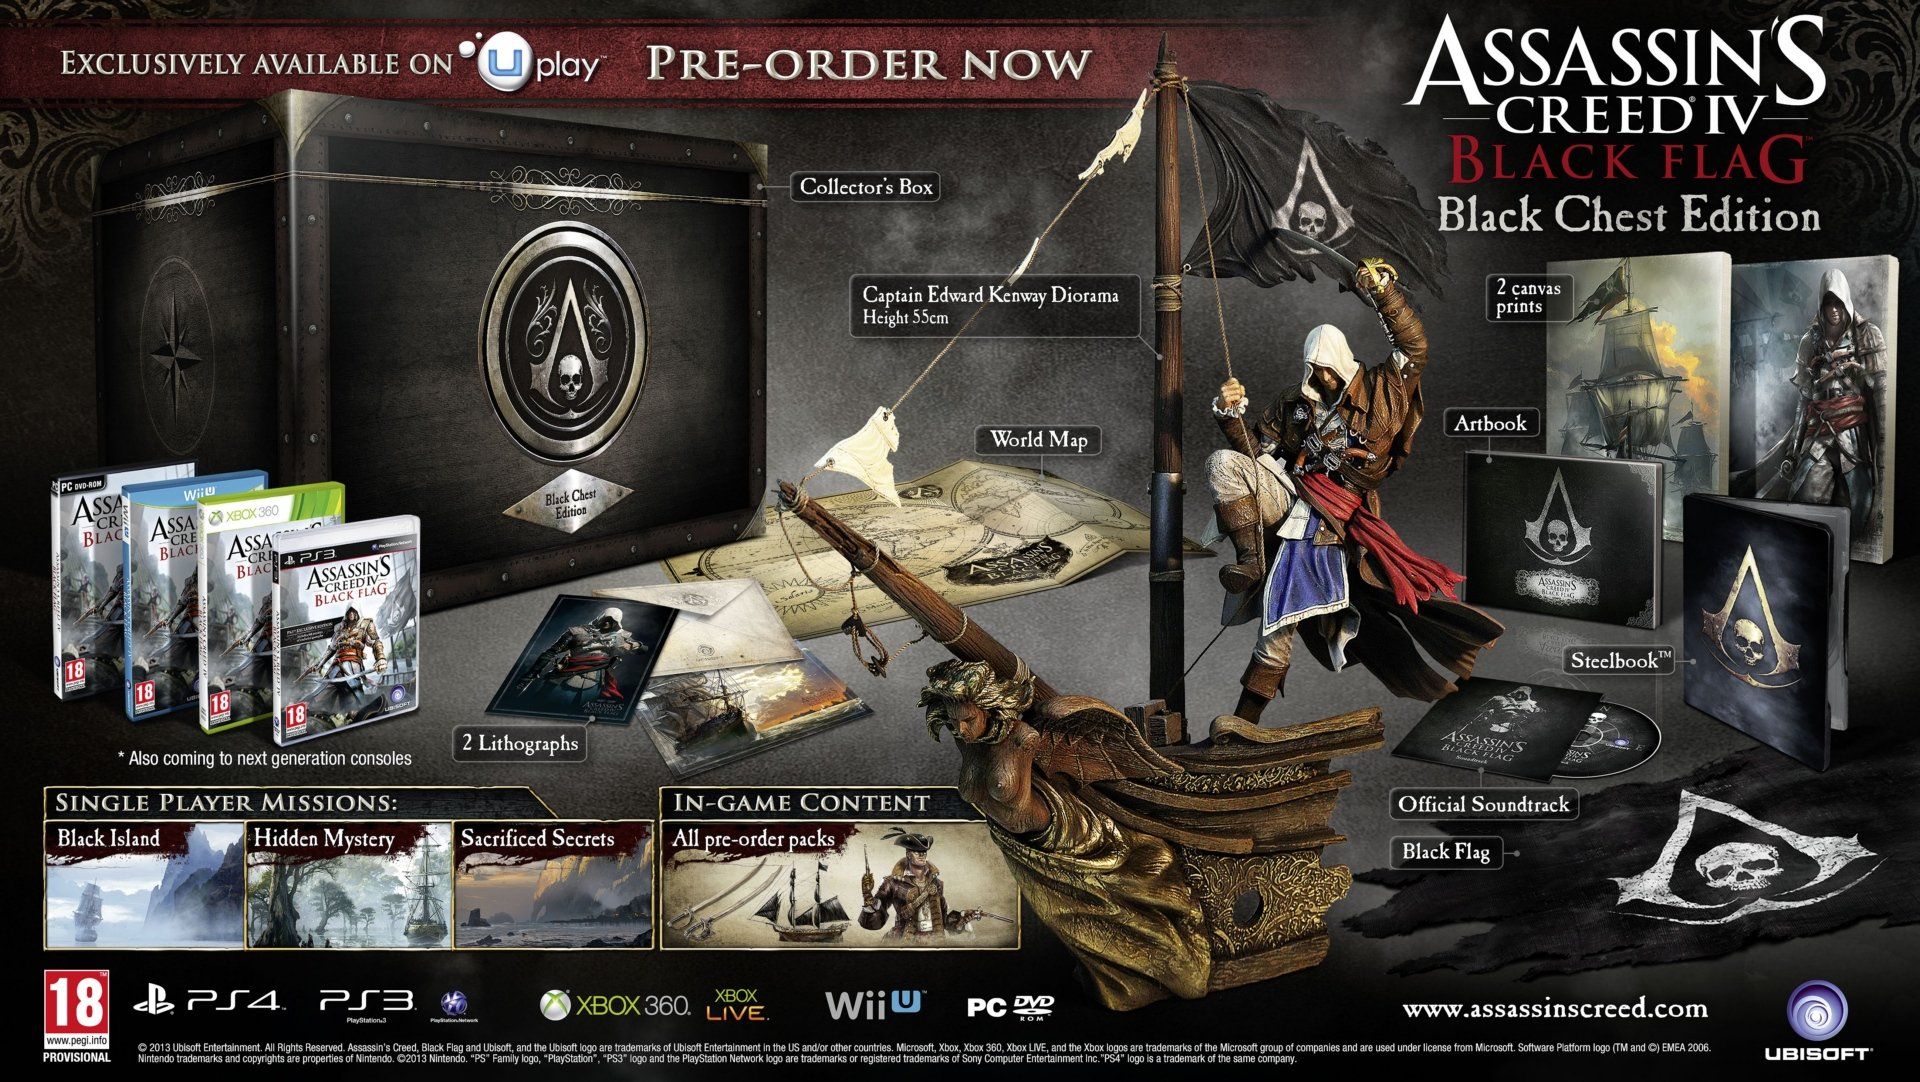 youtube.com/watch?feature=player_embedded&v=2dtf-ezfytMAssassin's Creed 4: Black Flag - коллекционные издания и  .... - Изображение 1